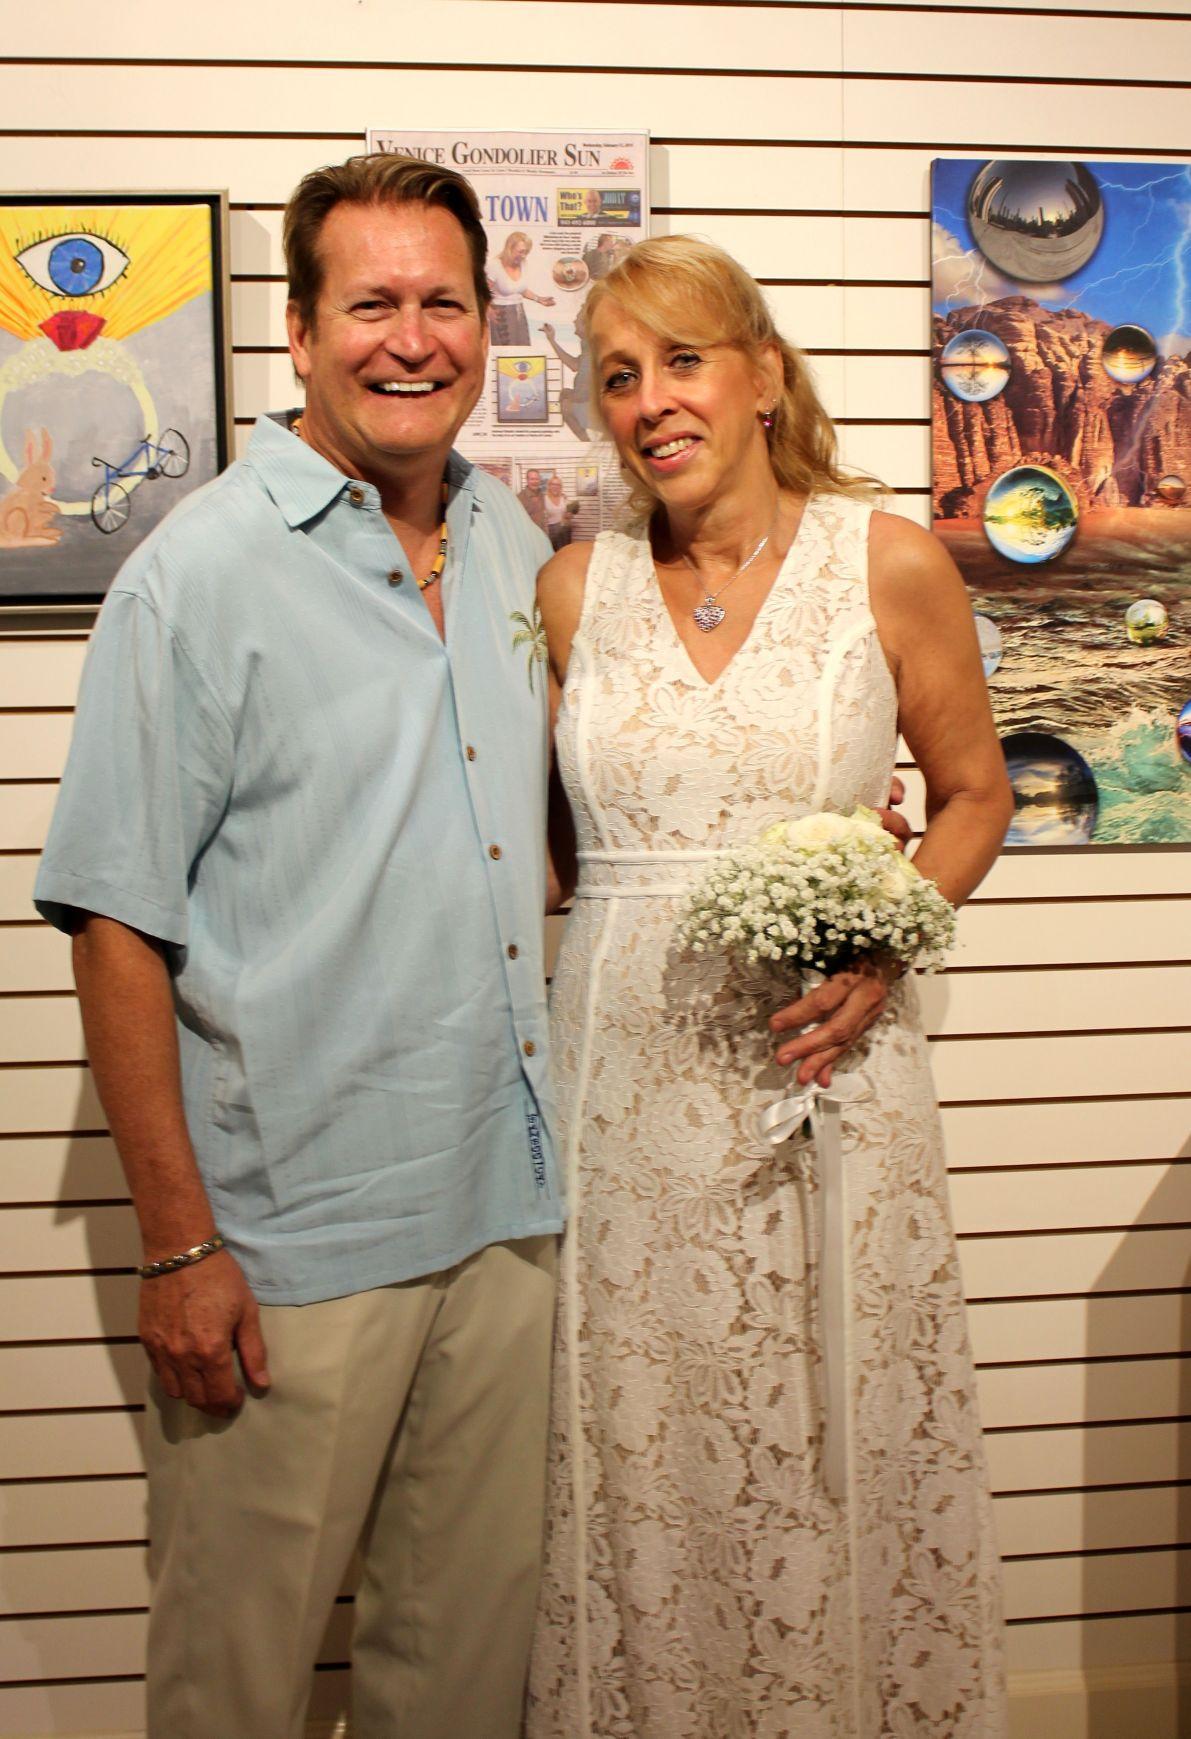 Anthony Riskalla and Wilhelmina de Haas